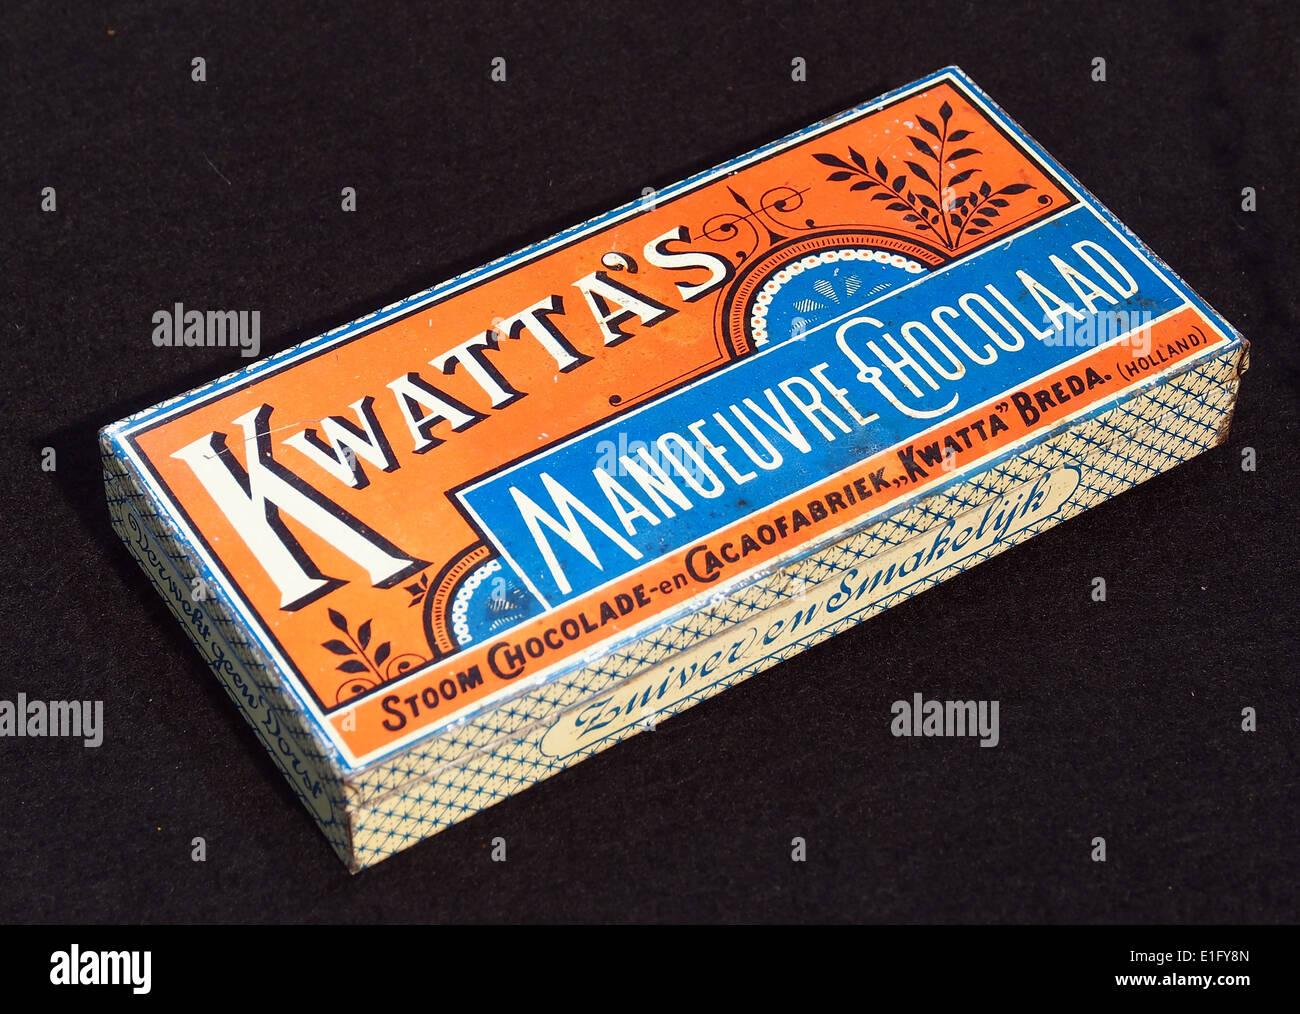 Kwattas Manoeuvre Chocolaad blik, foto6 - Stock Image